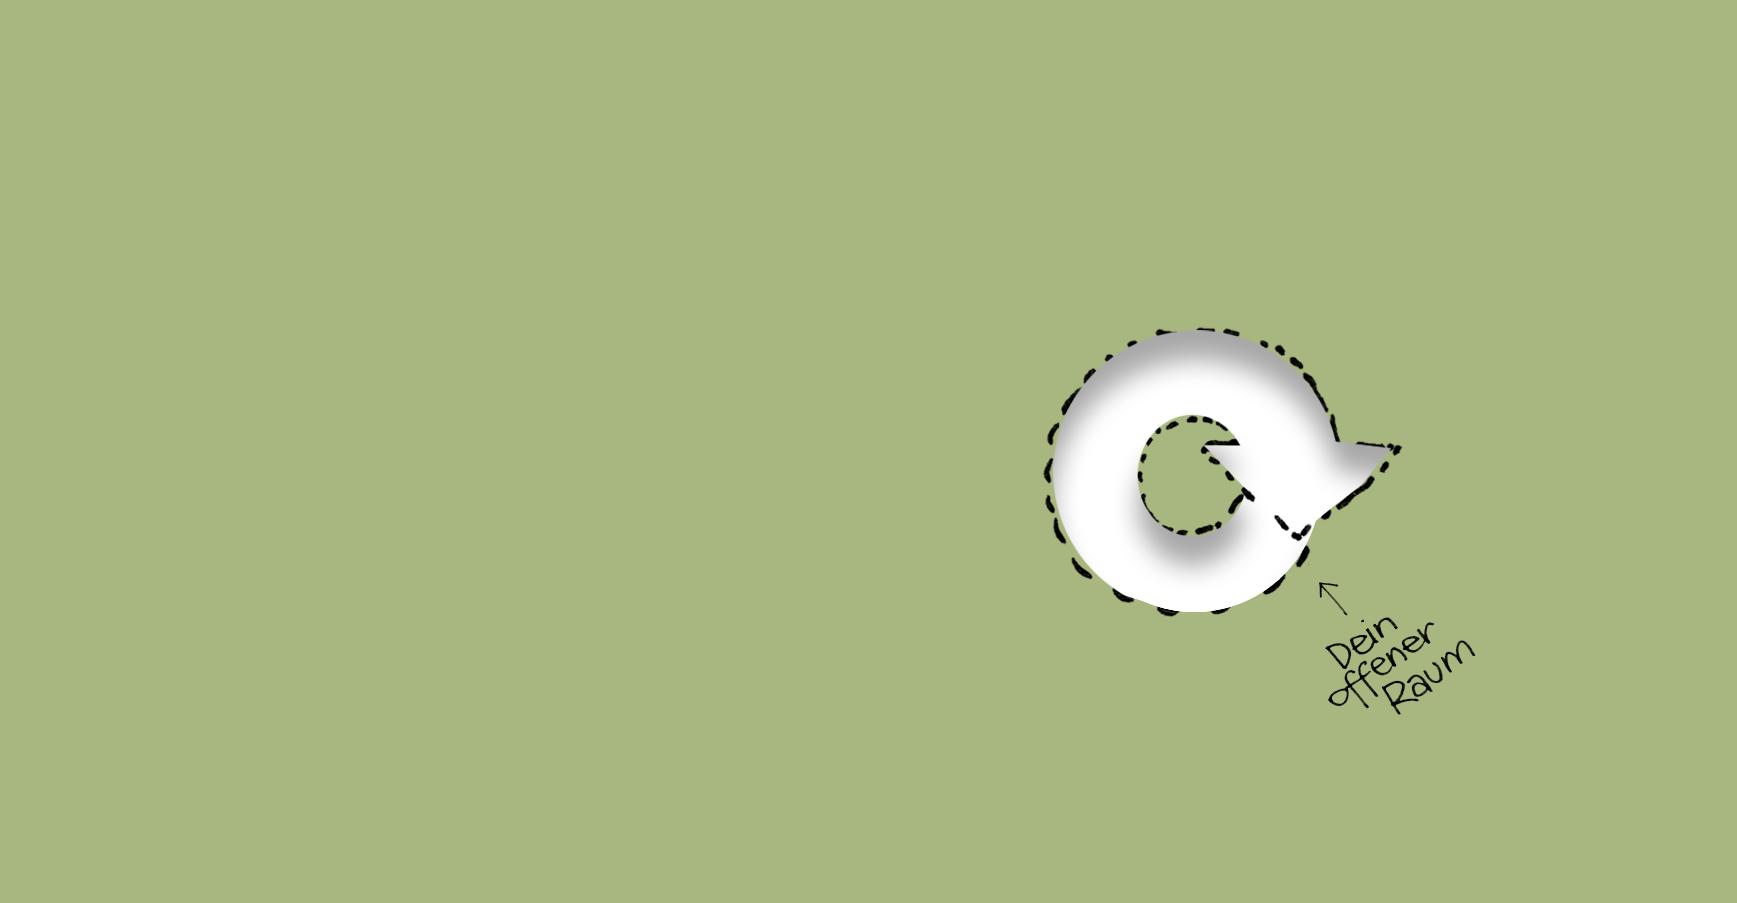 hg_otelo_repaircafe_neu2